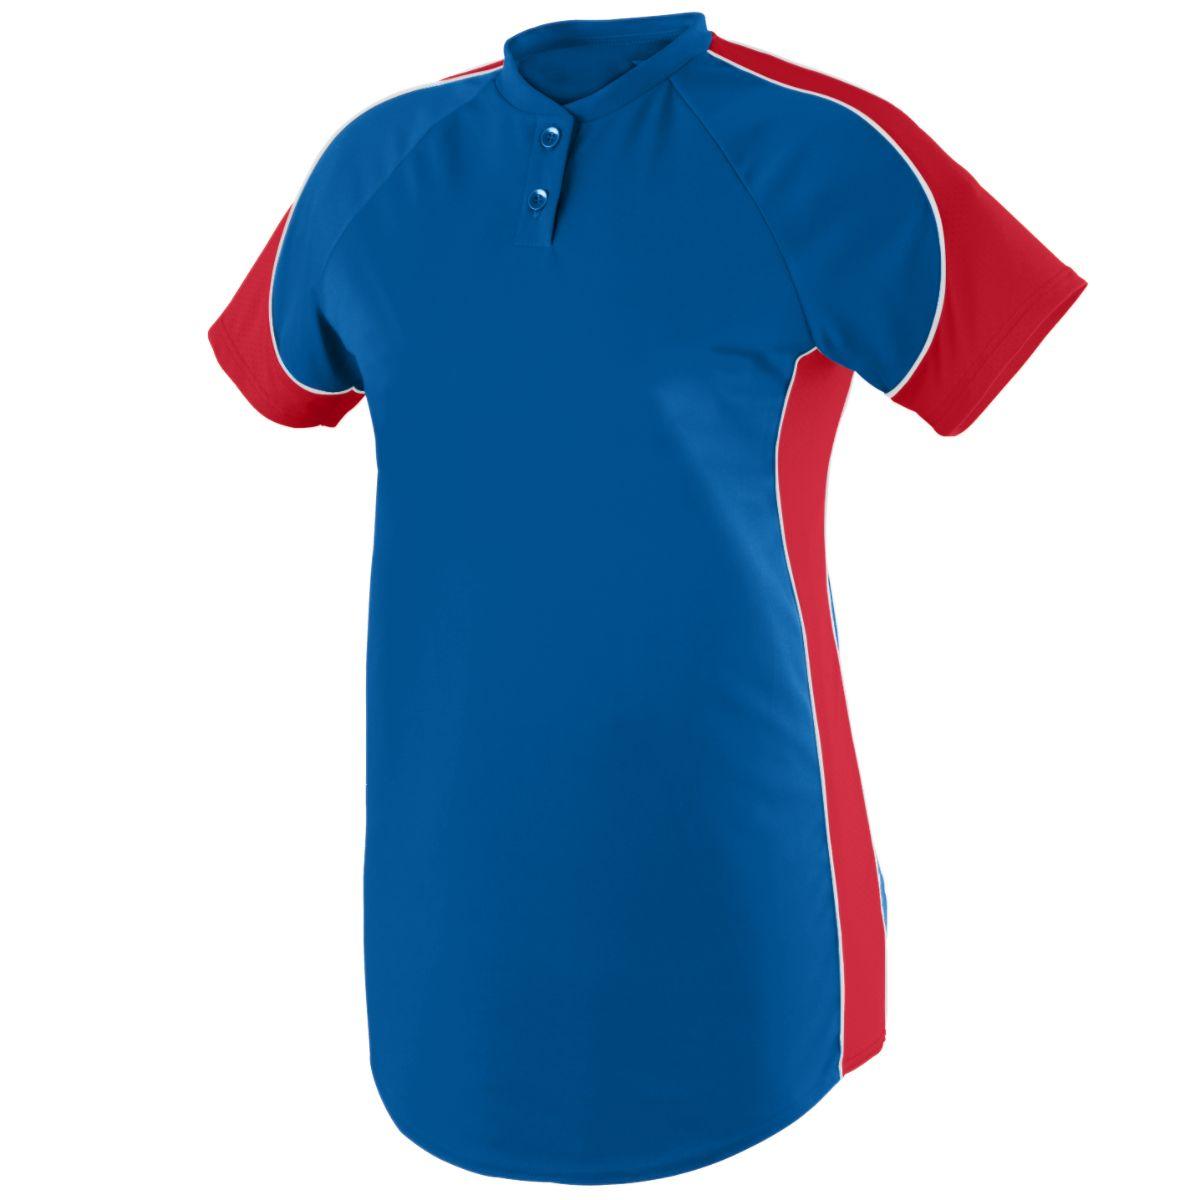 Augusta Sportswear Women's Blast Softball Jersey M Royal/Red/White - image 1 de 1